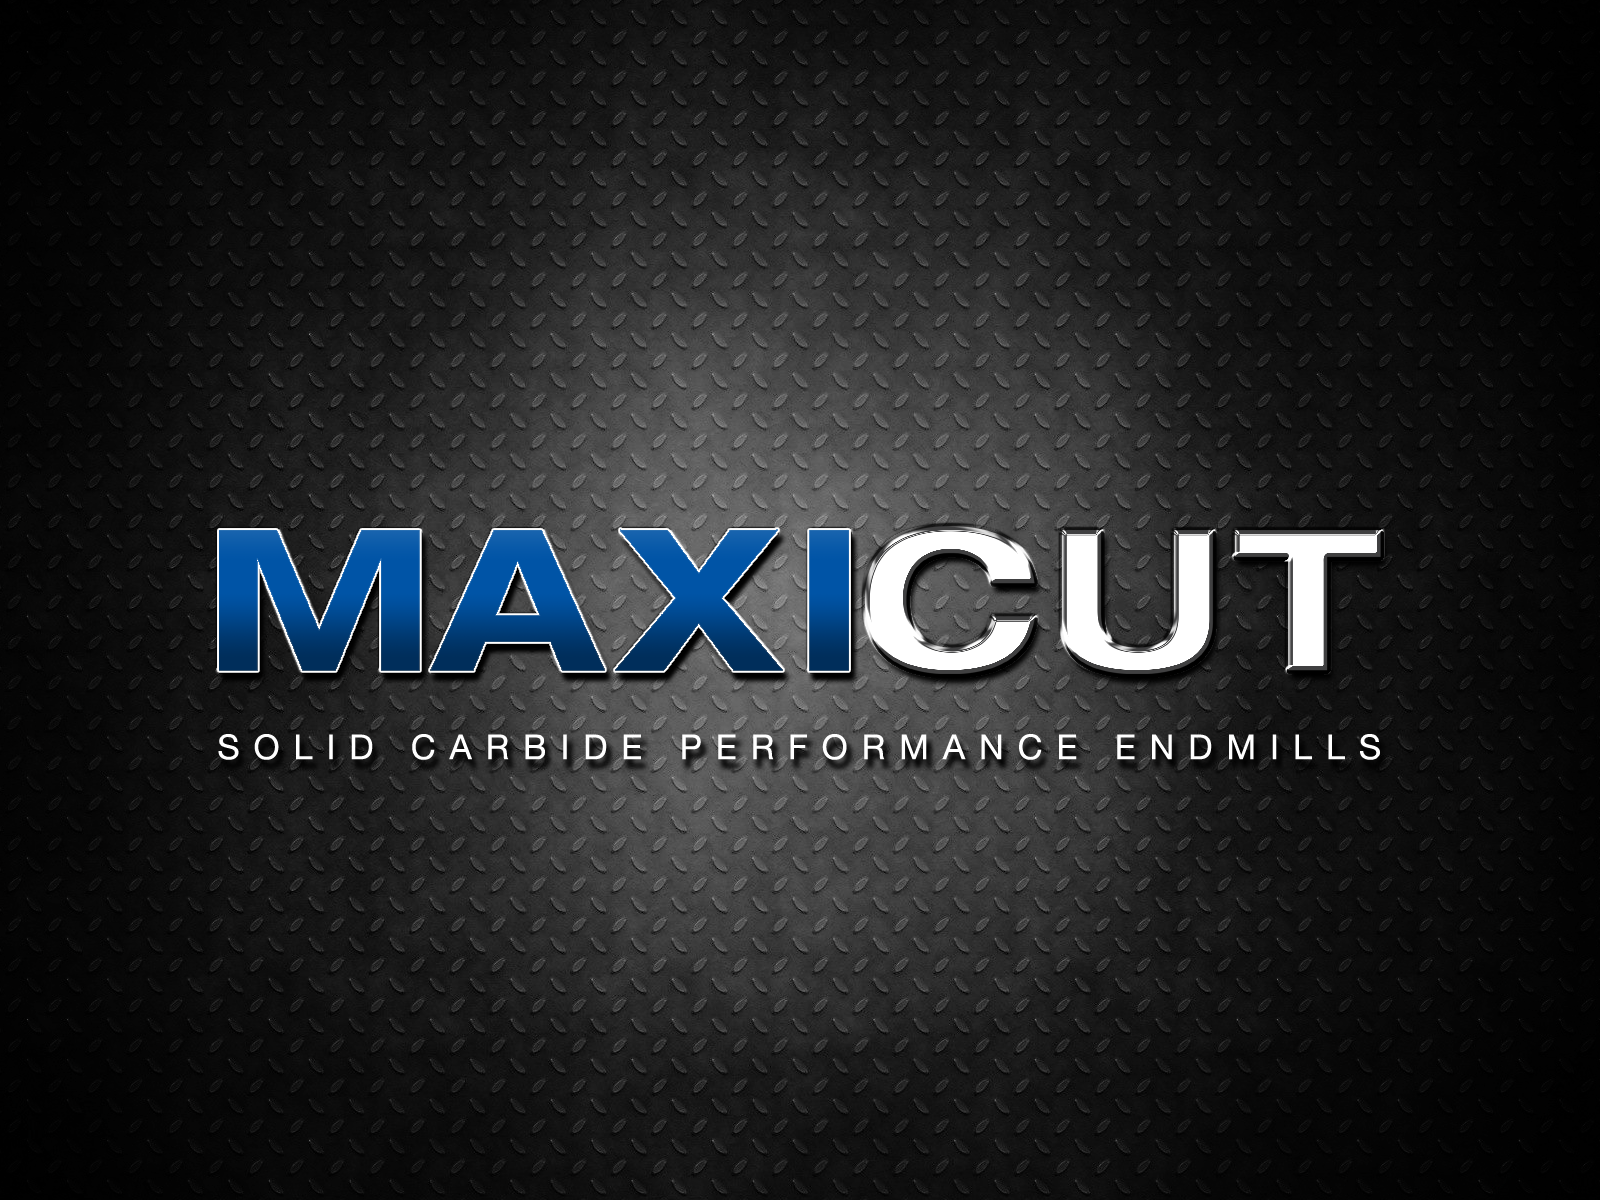 MAXICUT - High Performance (HPM) Solid Carbide Endmills